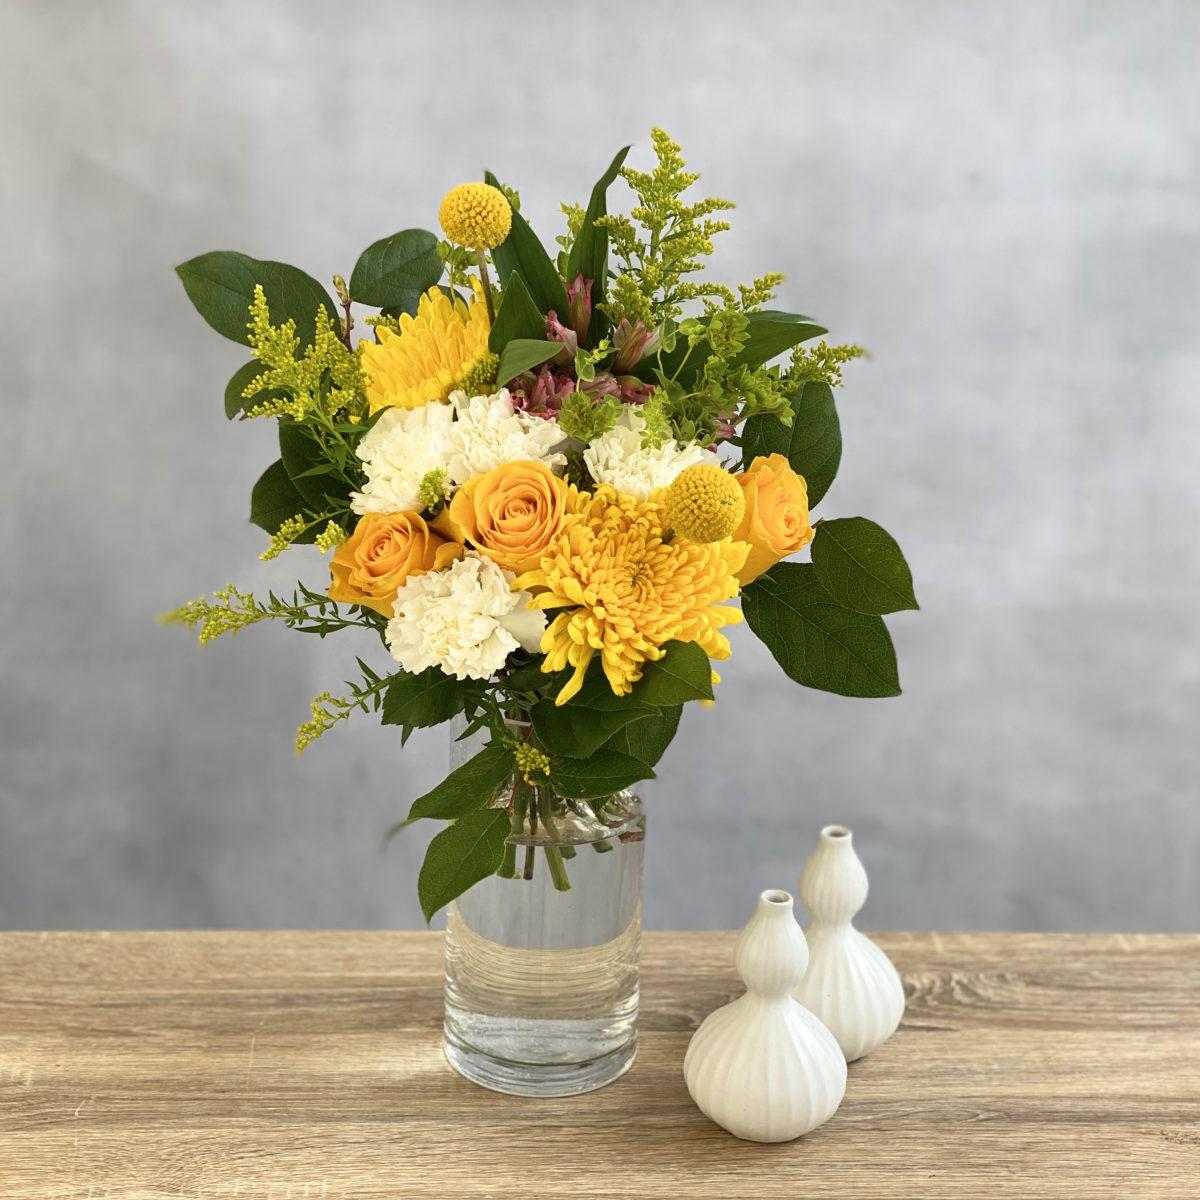 Rachel Cho Flowers | Floral Designer | Flower Delivery